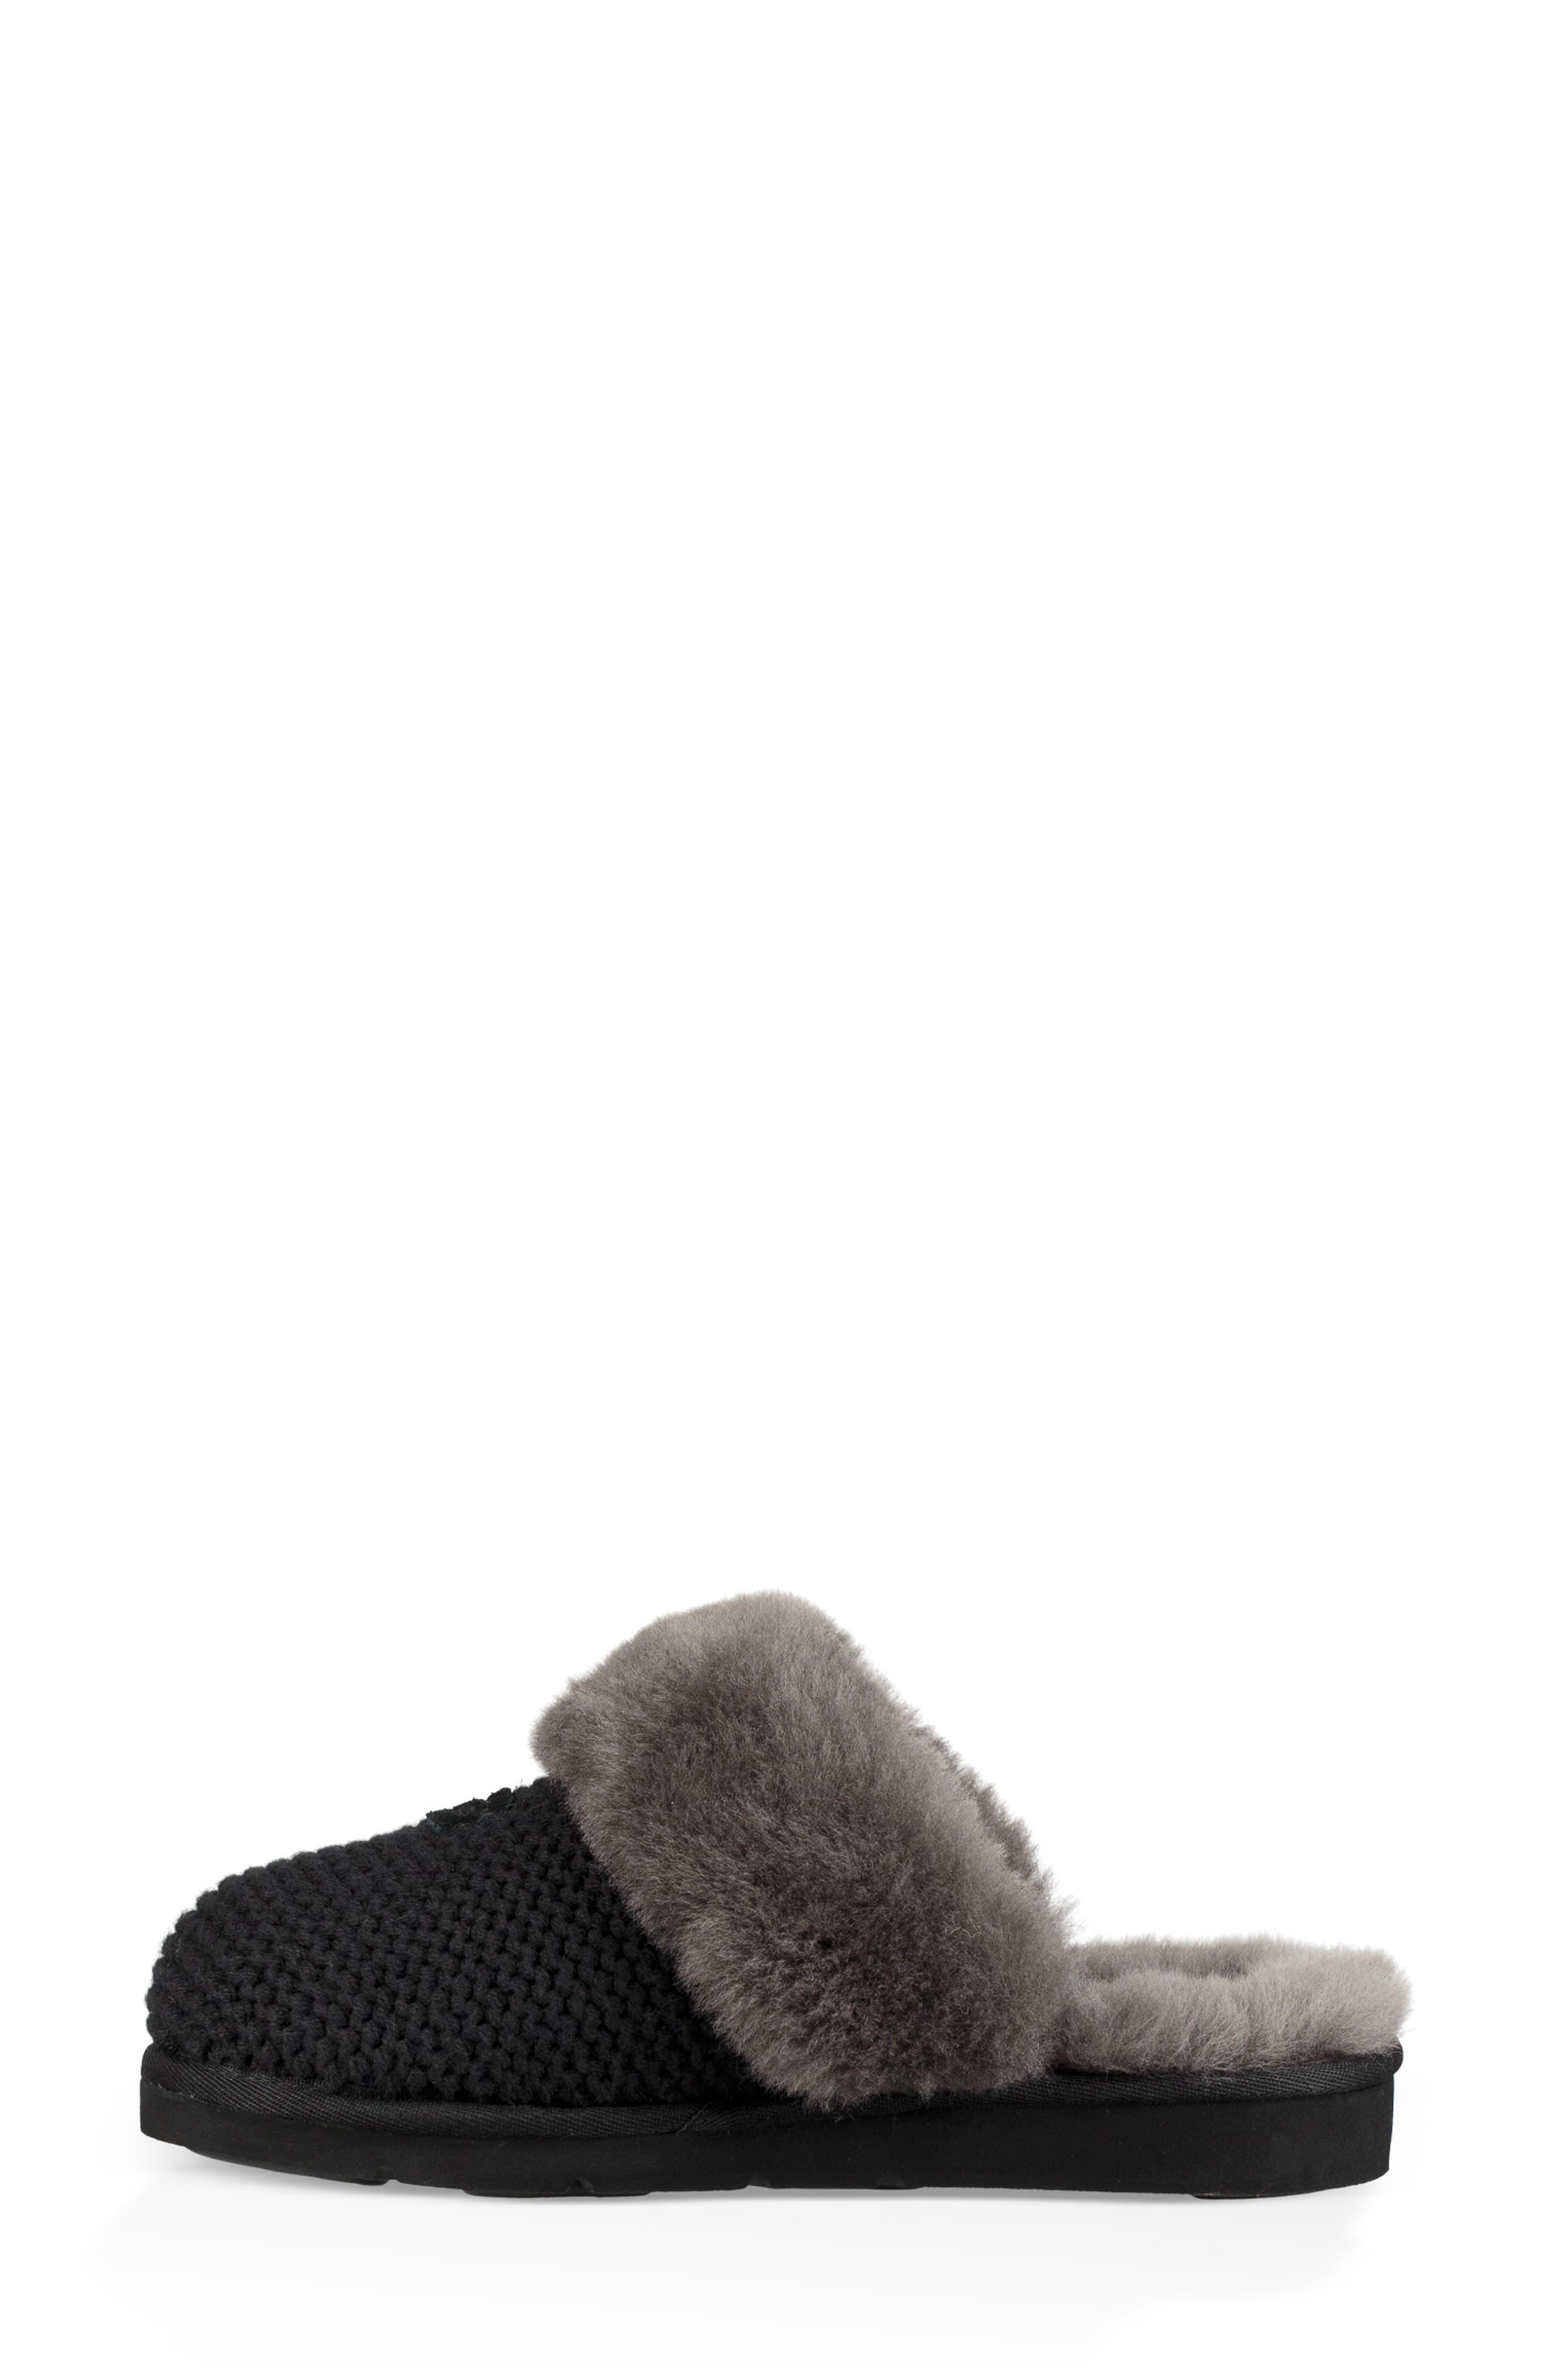 Cozy Knit Genuine Shearling Slipper,                             Alternate thumbnail 6, color,                             BLACK